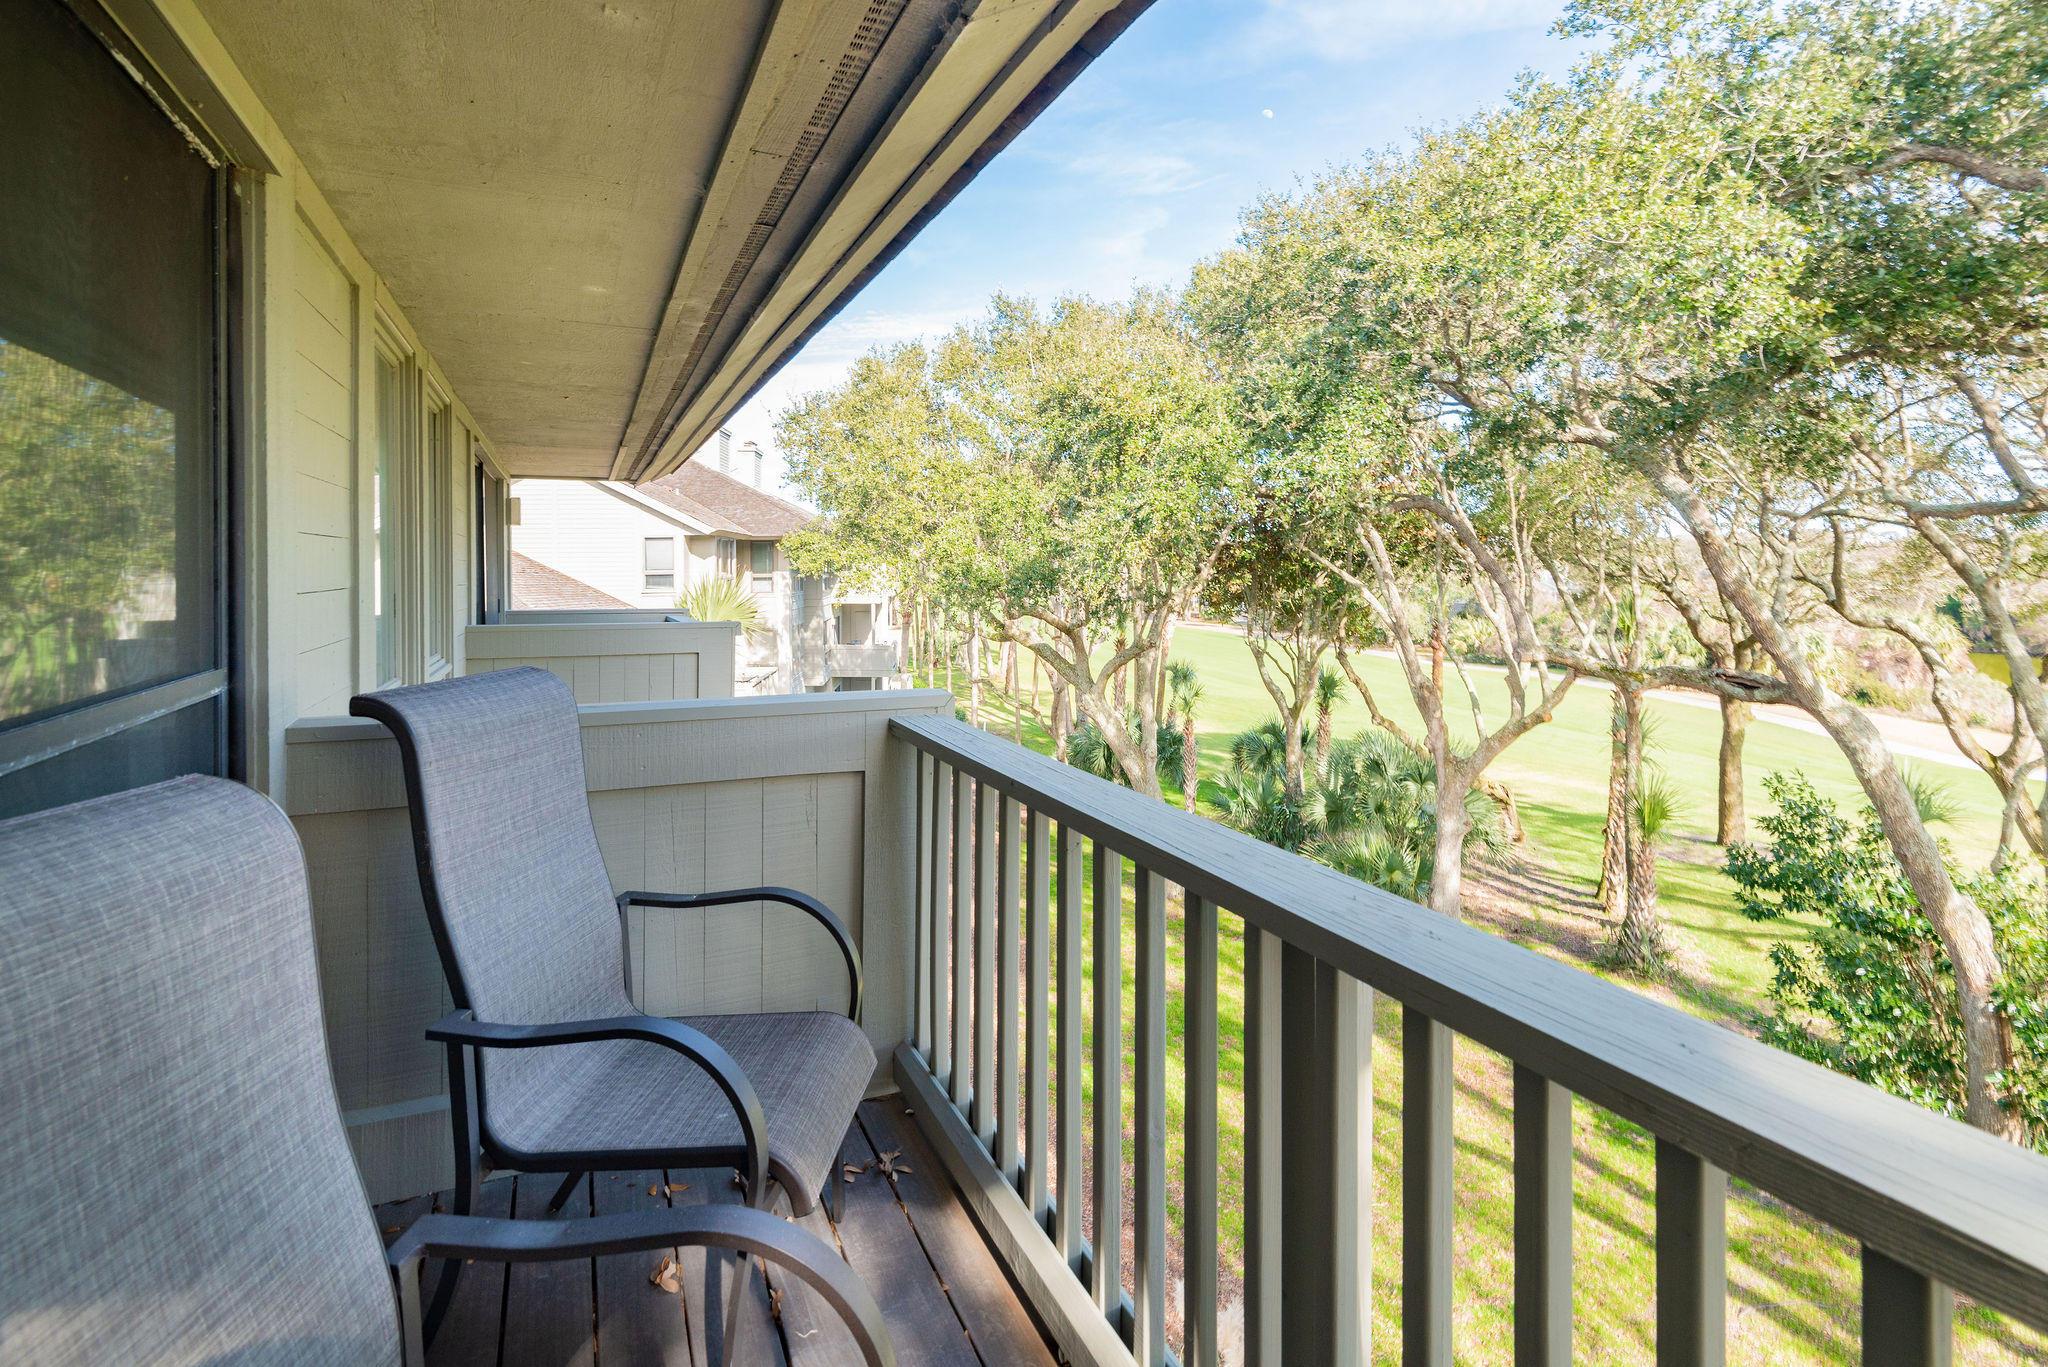 Kiawah Island Homes For Sale - 5004 Green Dolphin, Kiawah Island, SC - 13